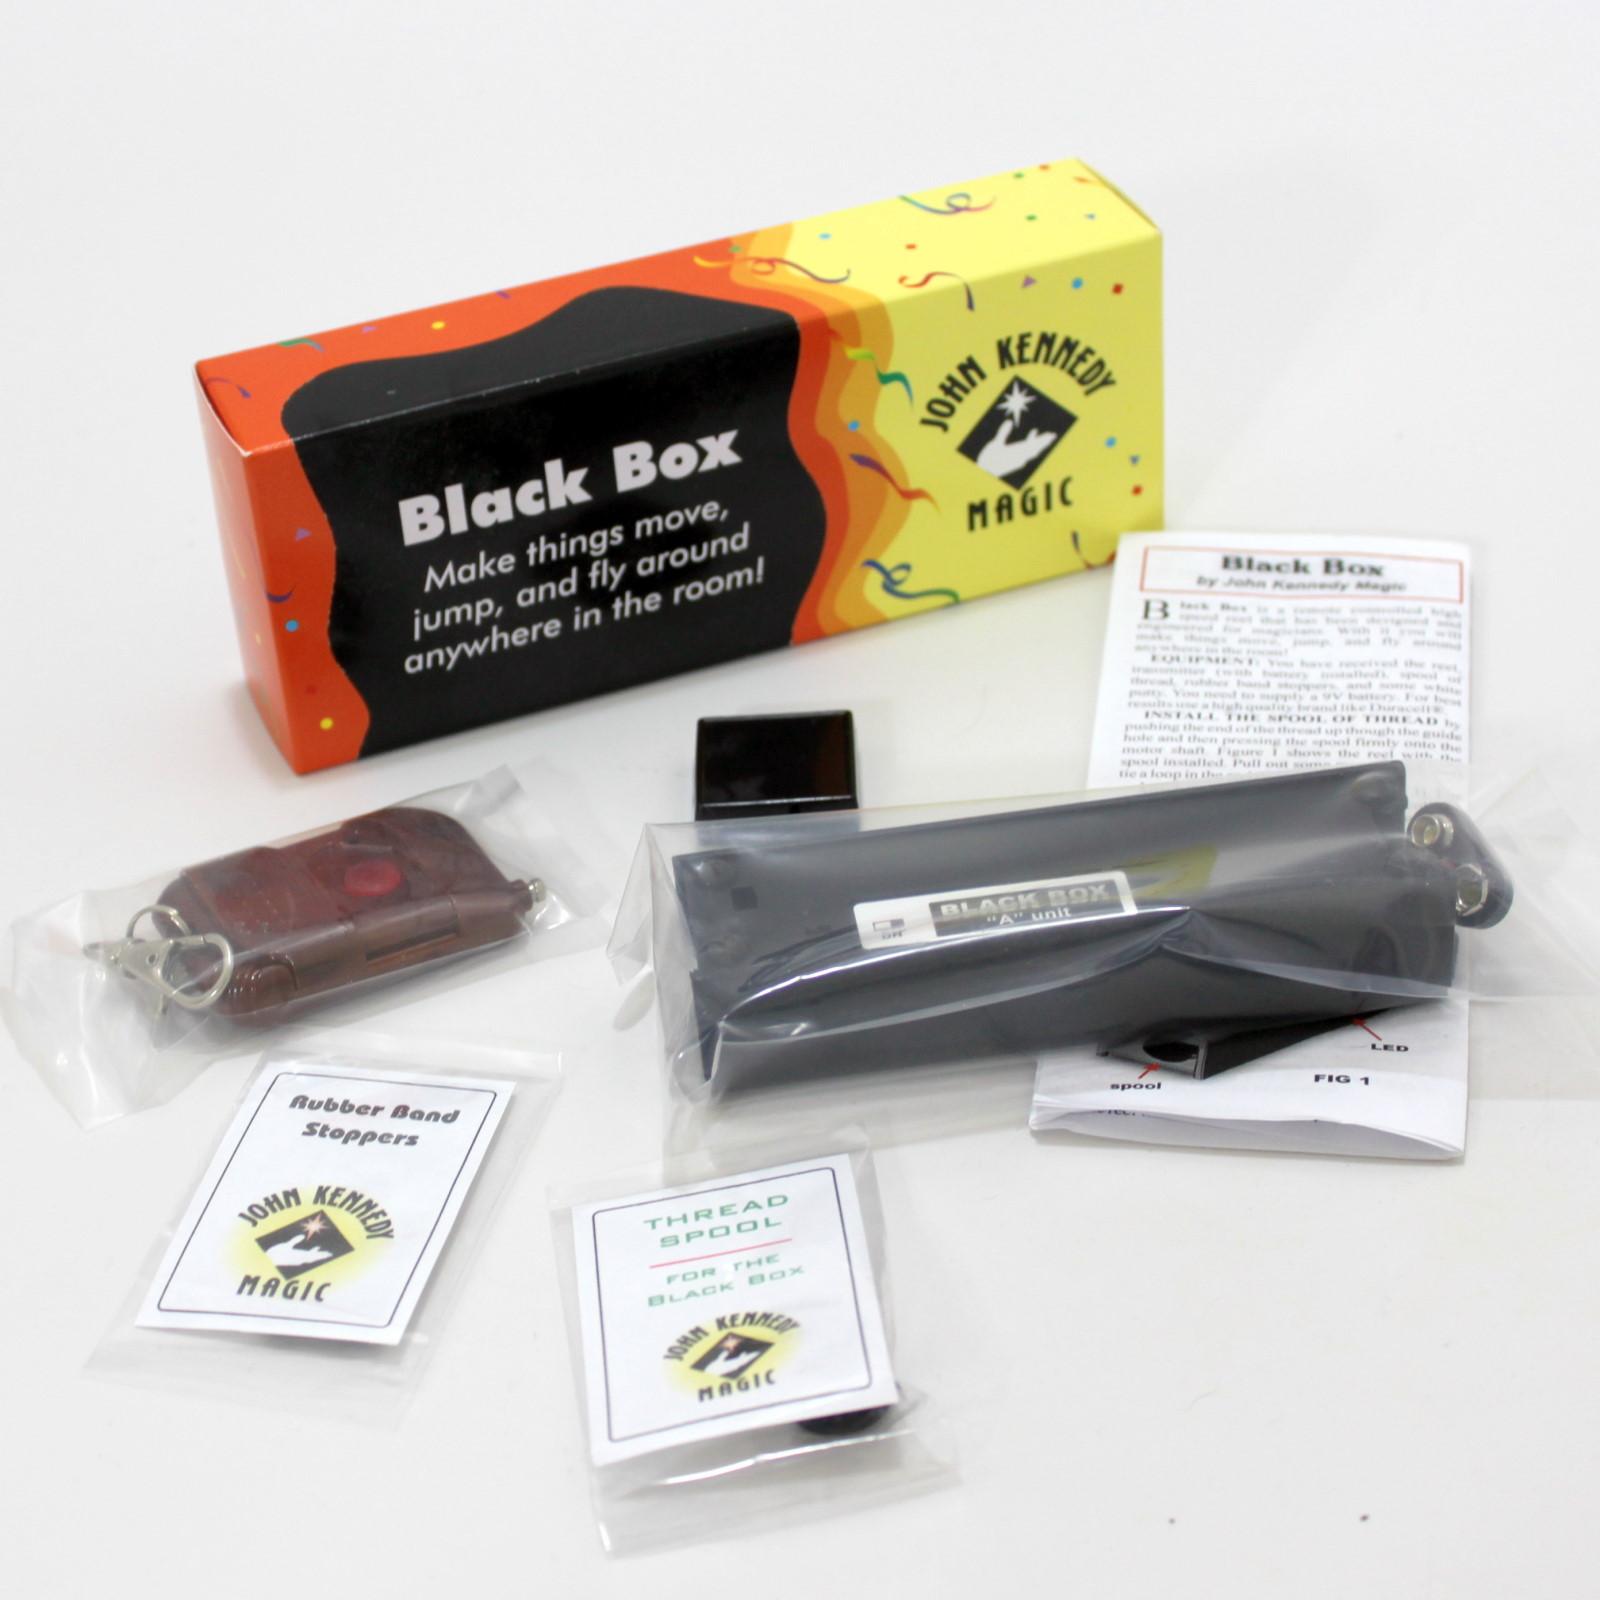 Black Box by John Kennedy